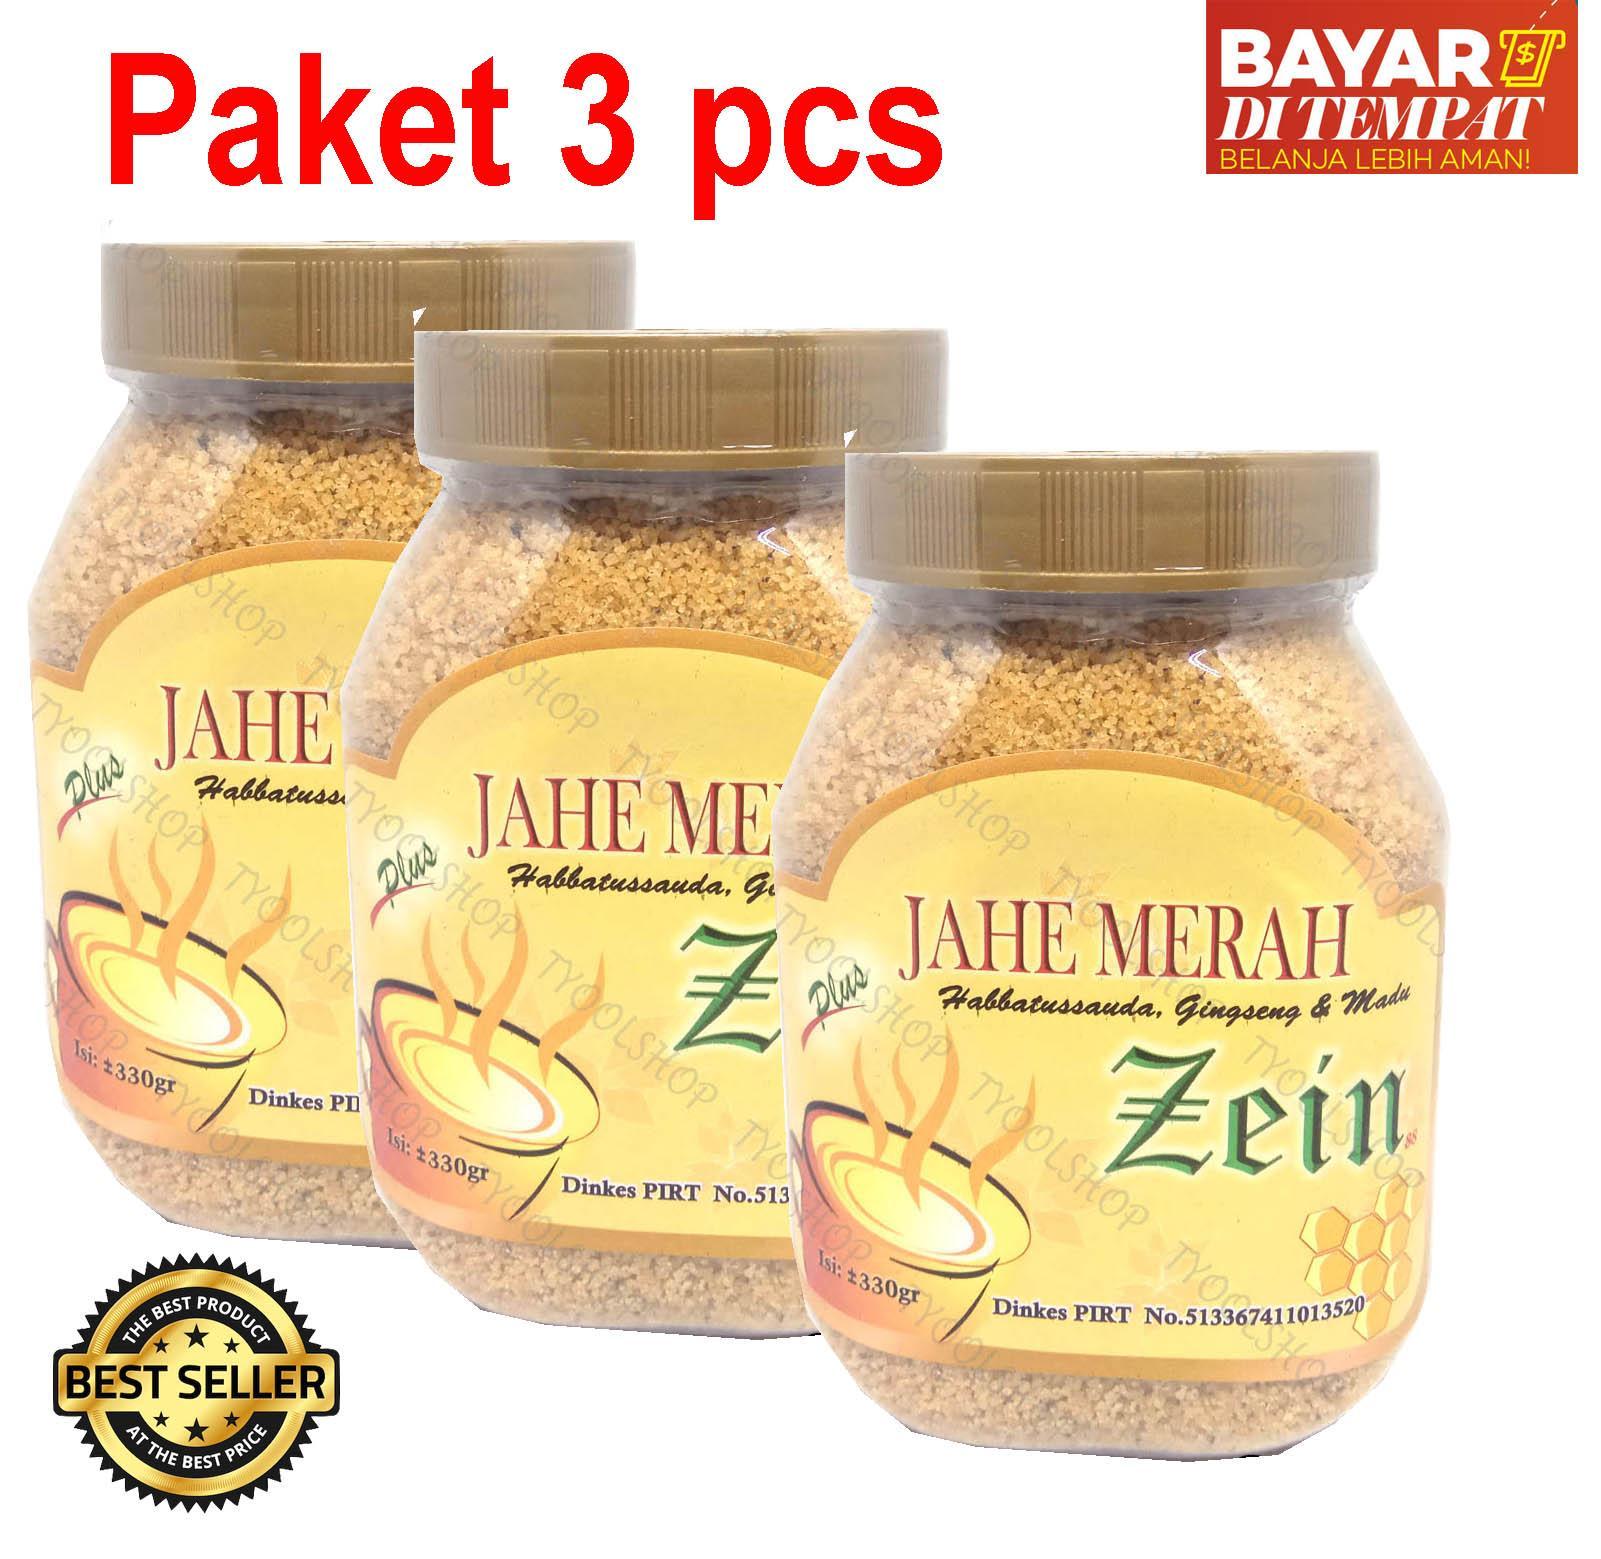 [ PAKET 3 pcs ] JAHE MERAH ZEIN plus habbatussauda madu dan ginseng - 330 gr